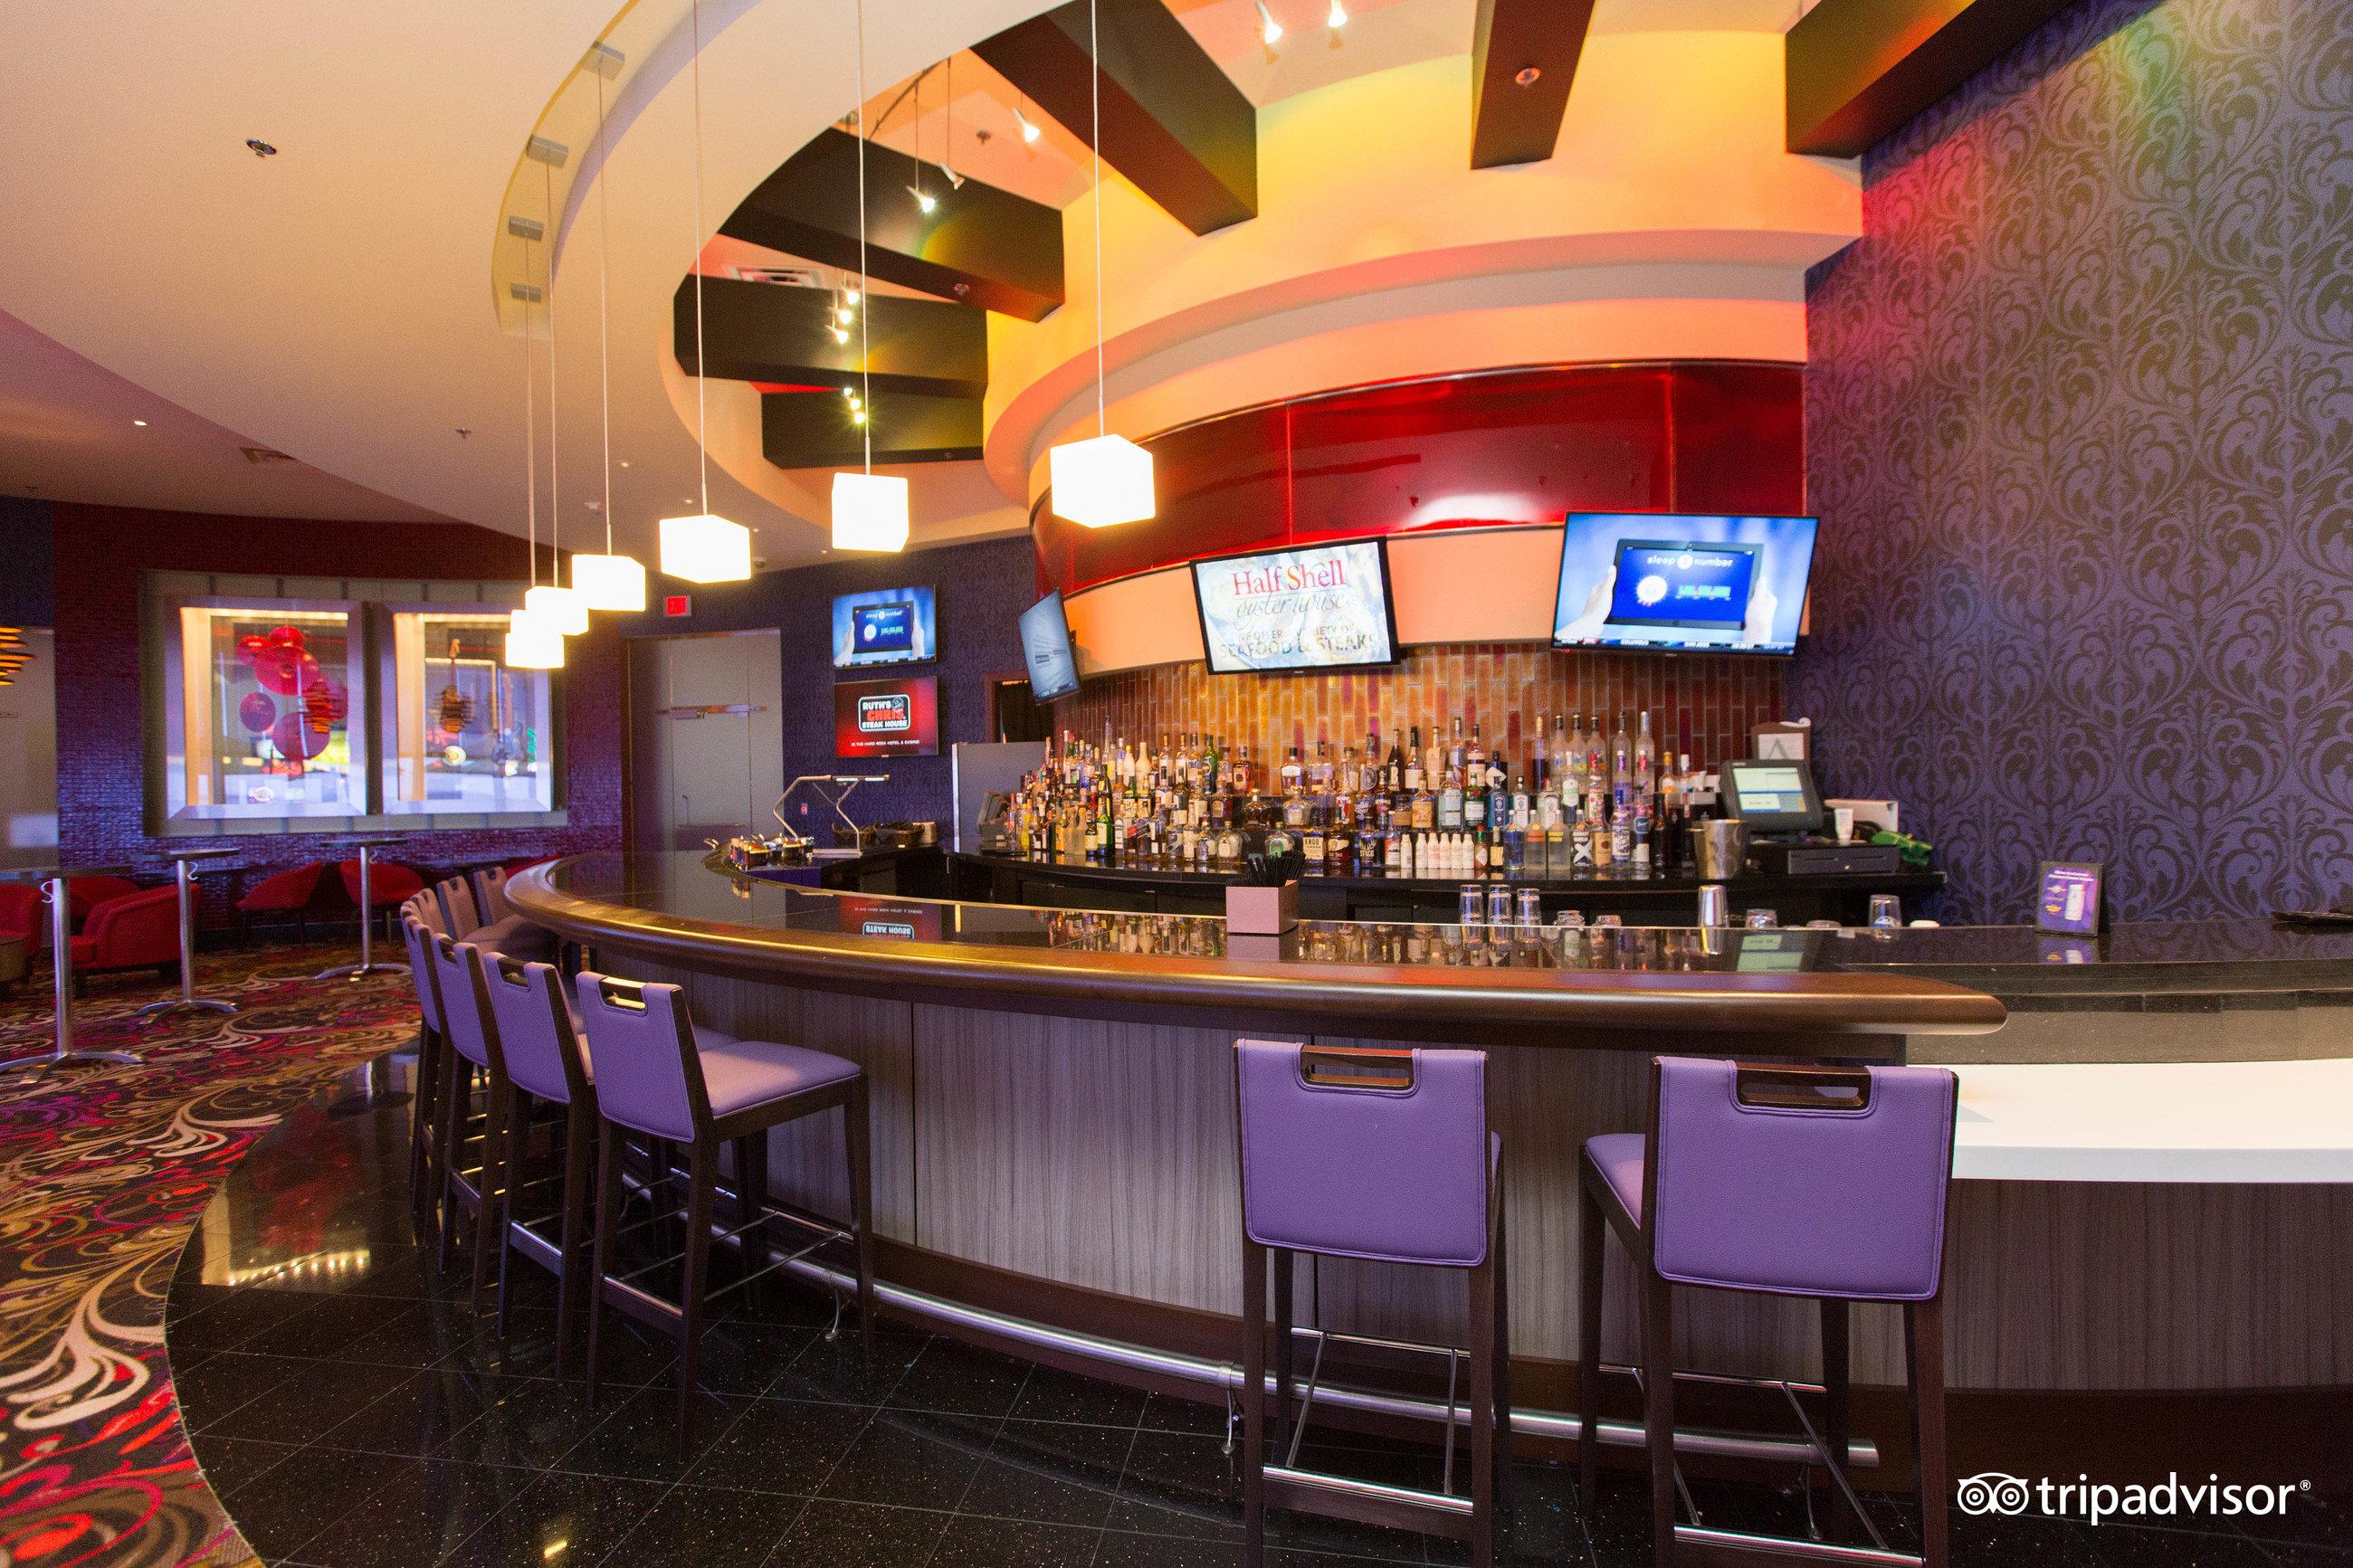 Hard rock casino biloxi hotel rates